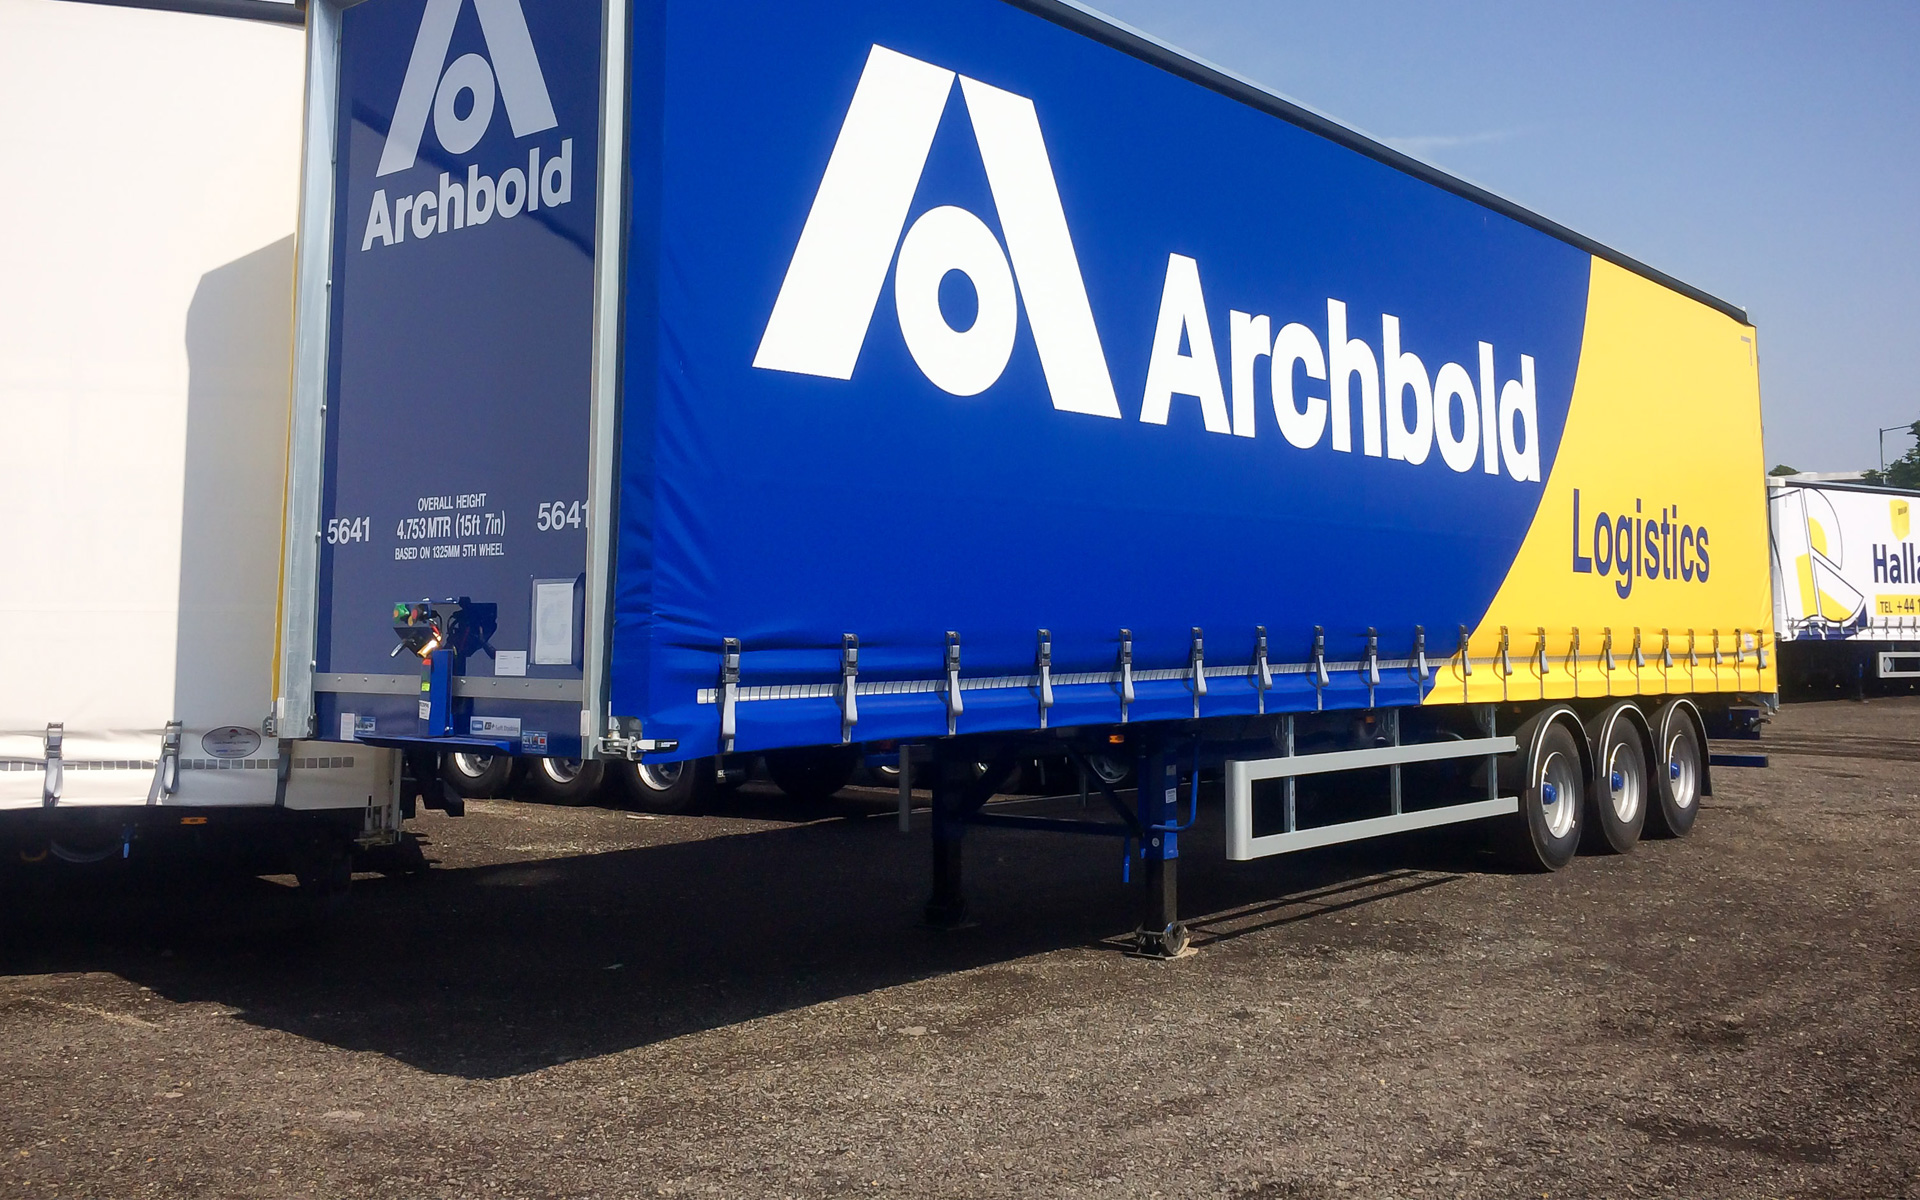 Archbold Logistics